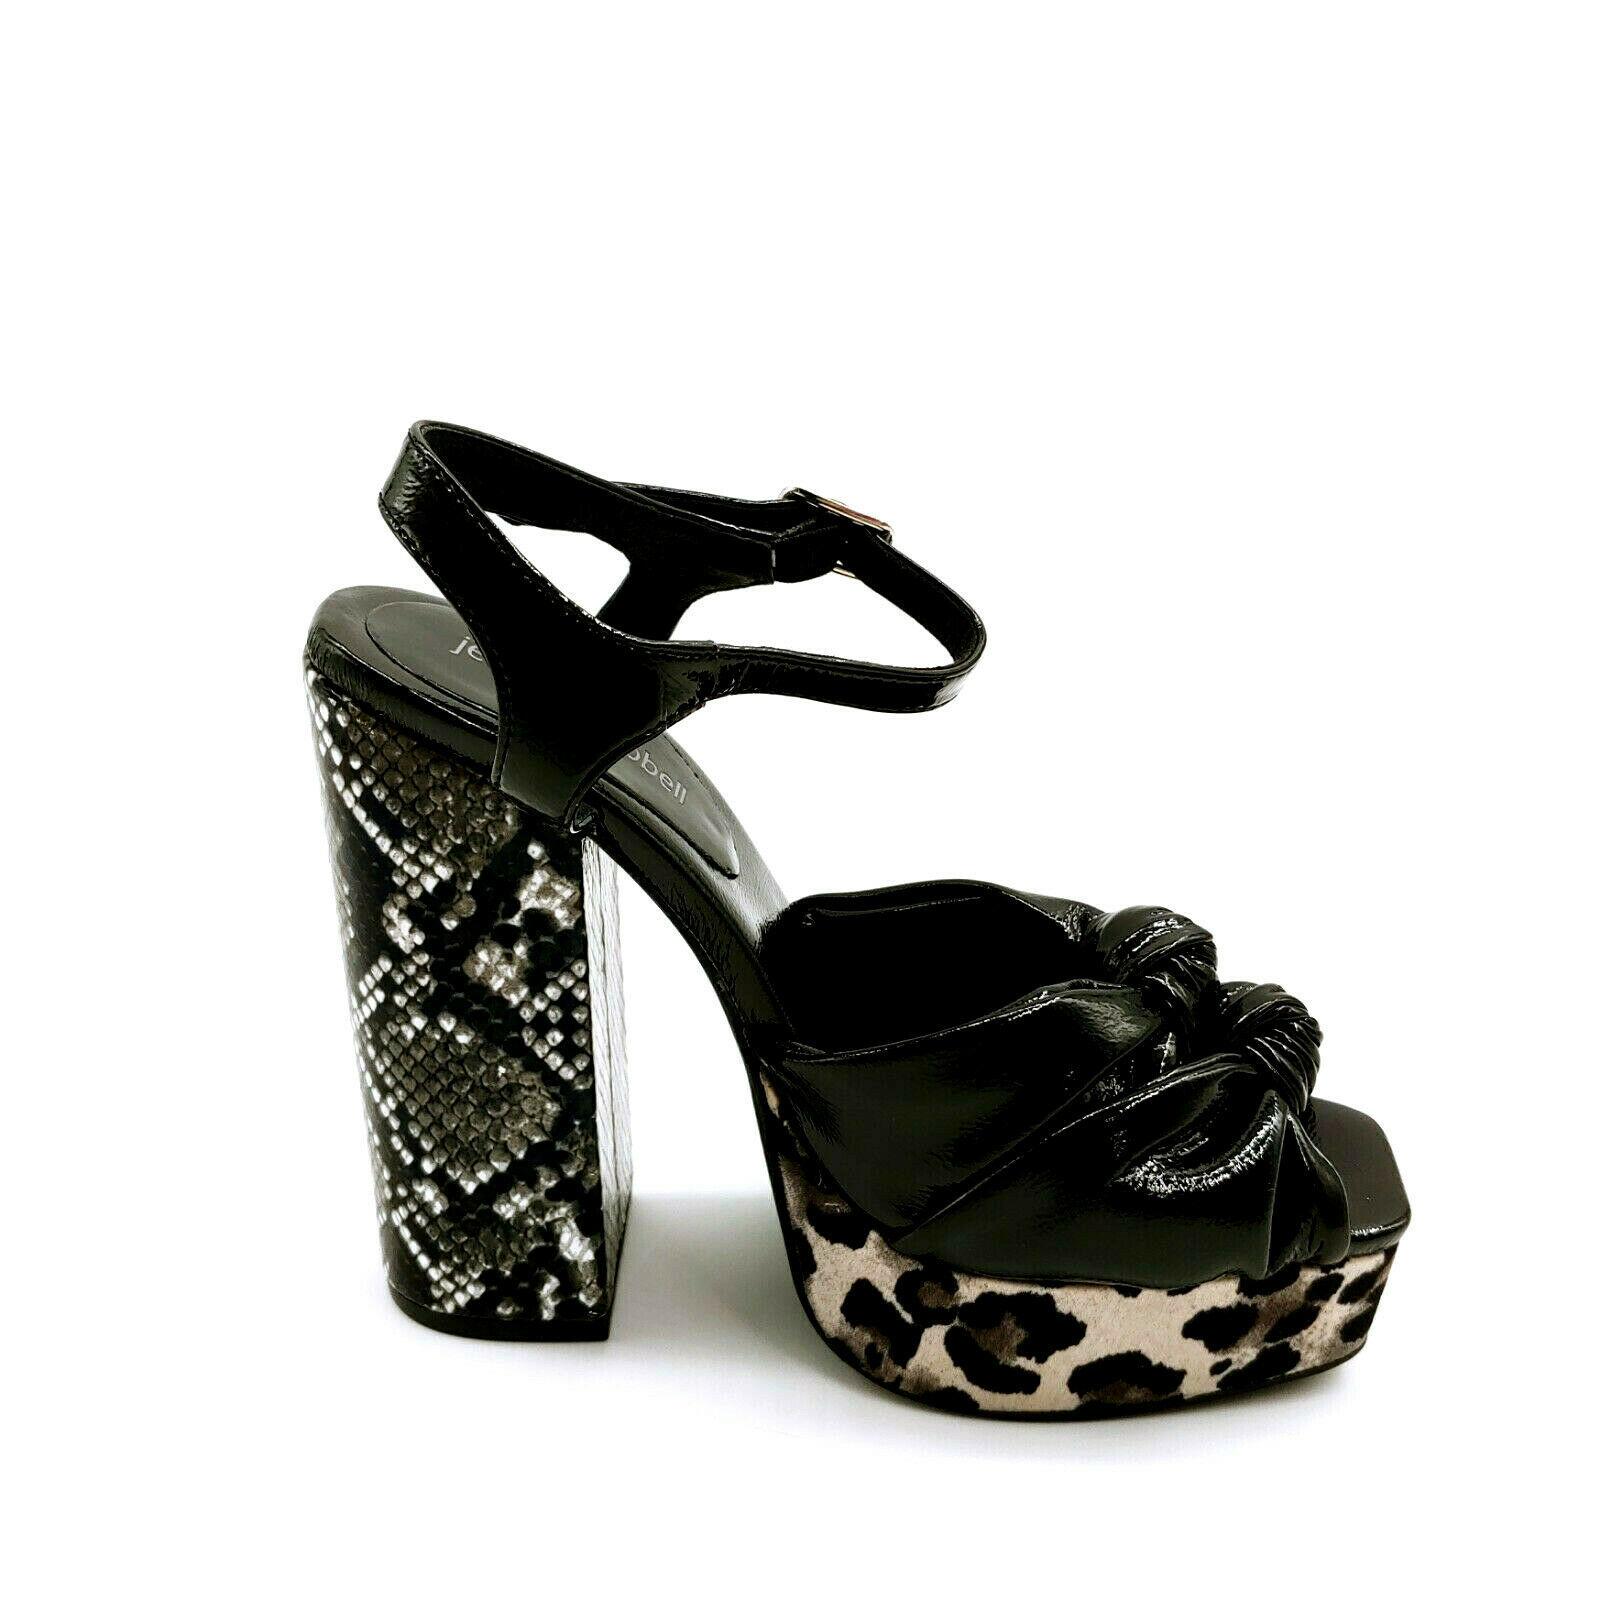 Jeffrey Campbell Womans High Heel Platform Sandal Black Multi Color Sz 7 M - $79.19